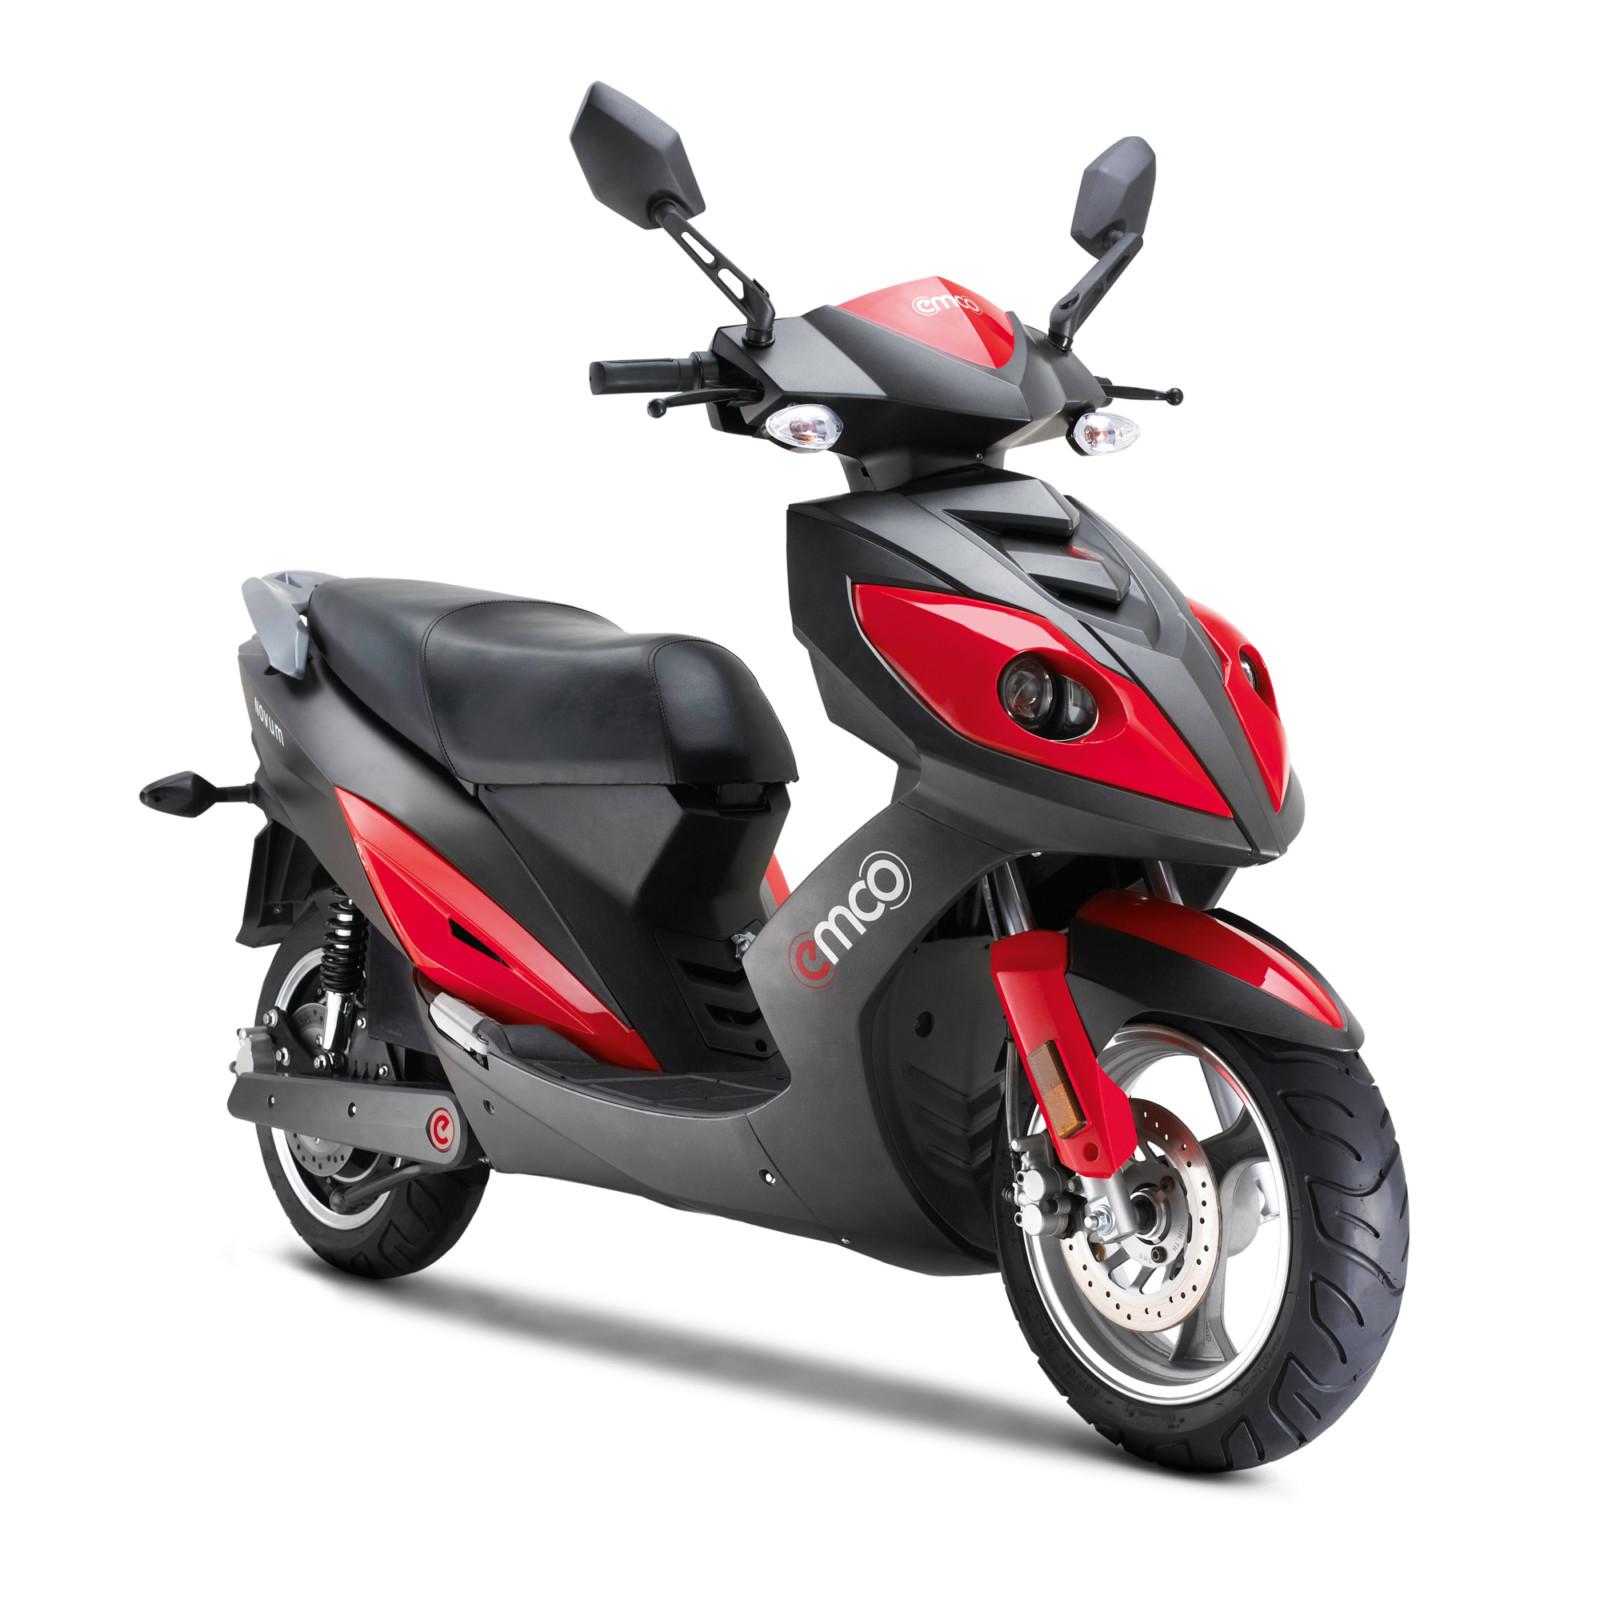 emco novum s 3000 electric scooters 2018. Black Bedroom Furniture Sets. Home Design Ideas